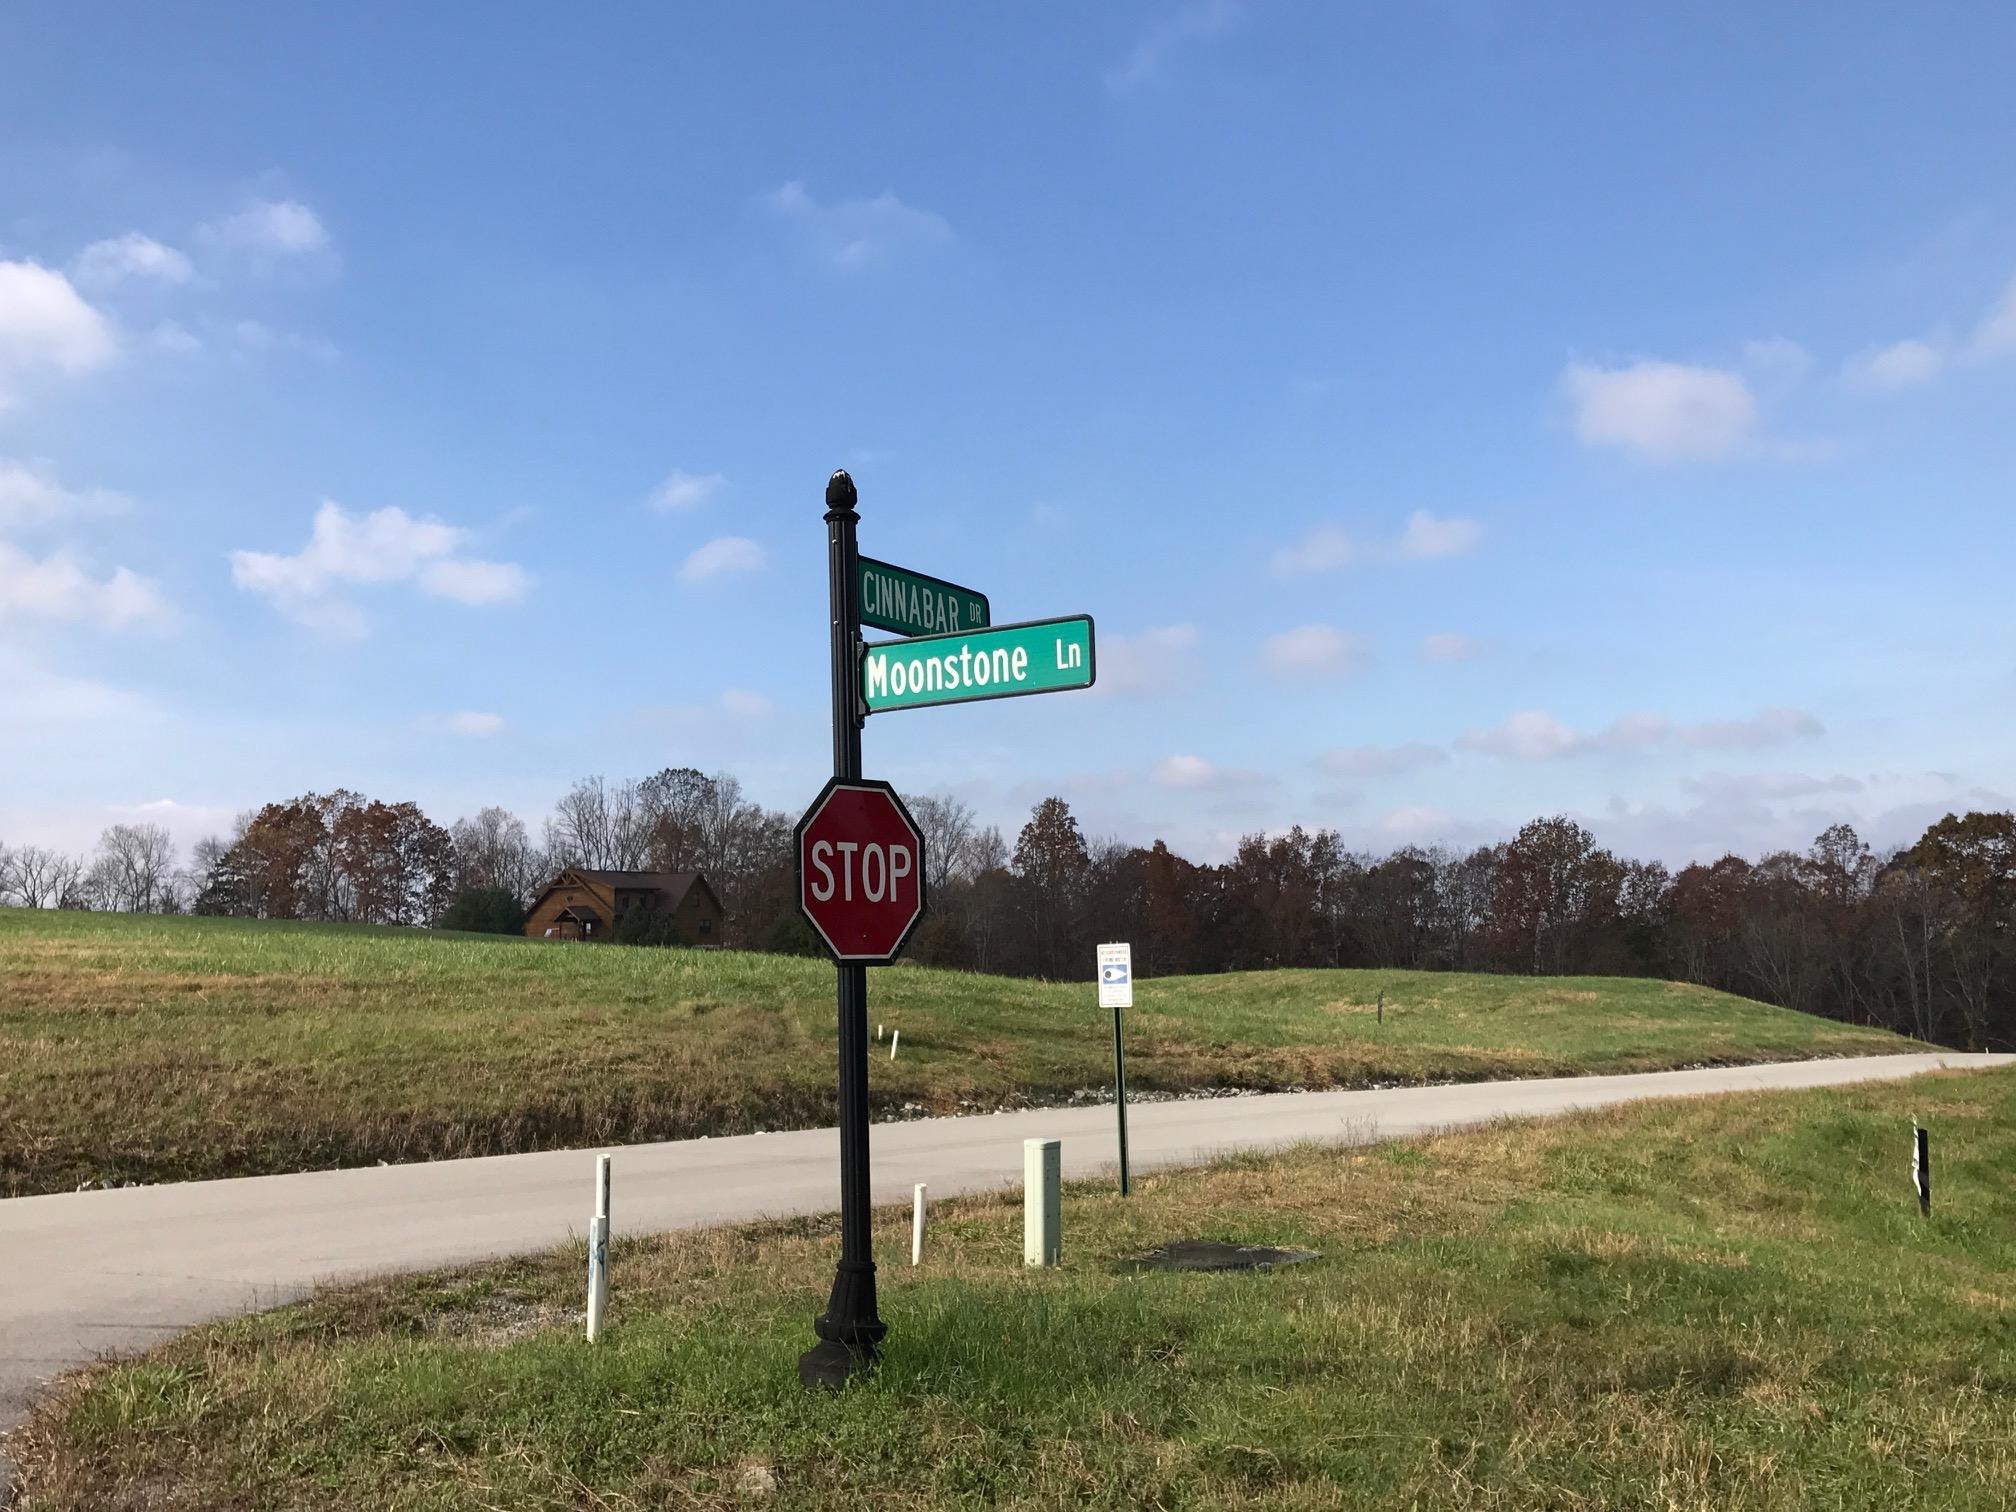 Lot 186 Moonstone Lane: